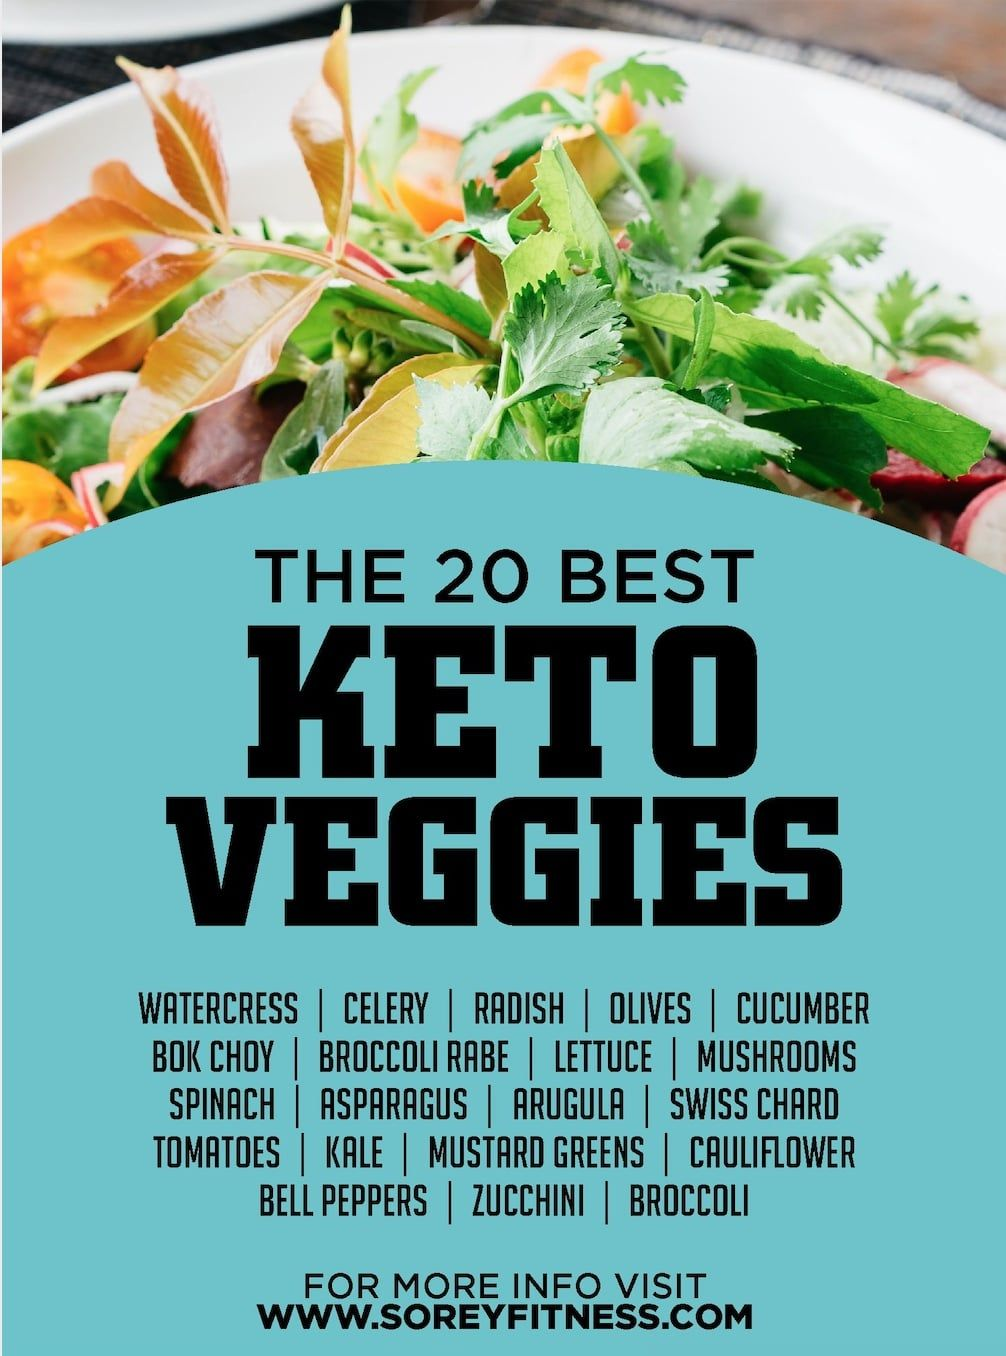 20 Best Keto Veggies List & Which Vegetables to Avoid on